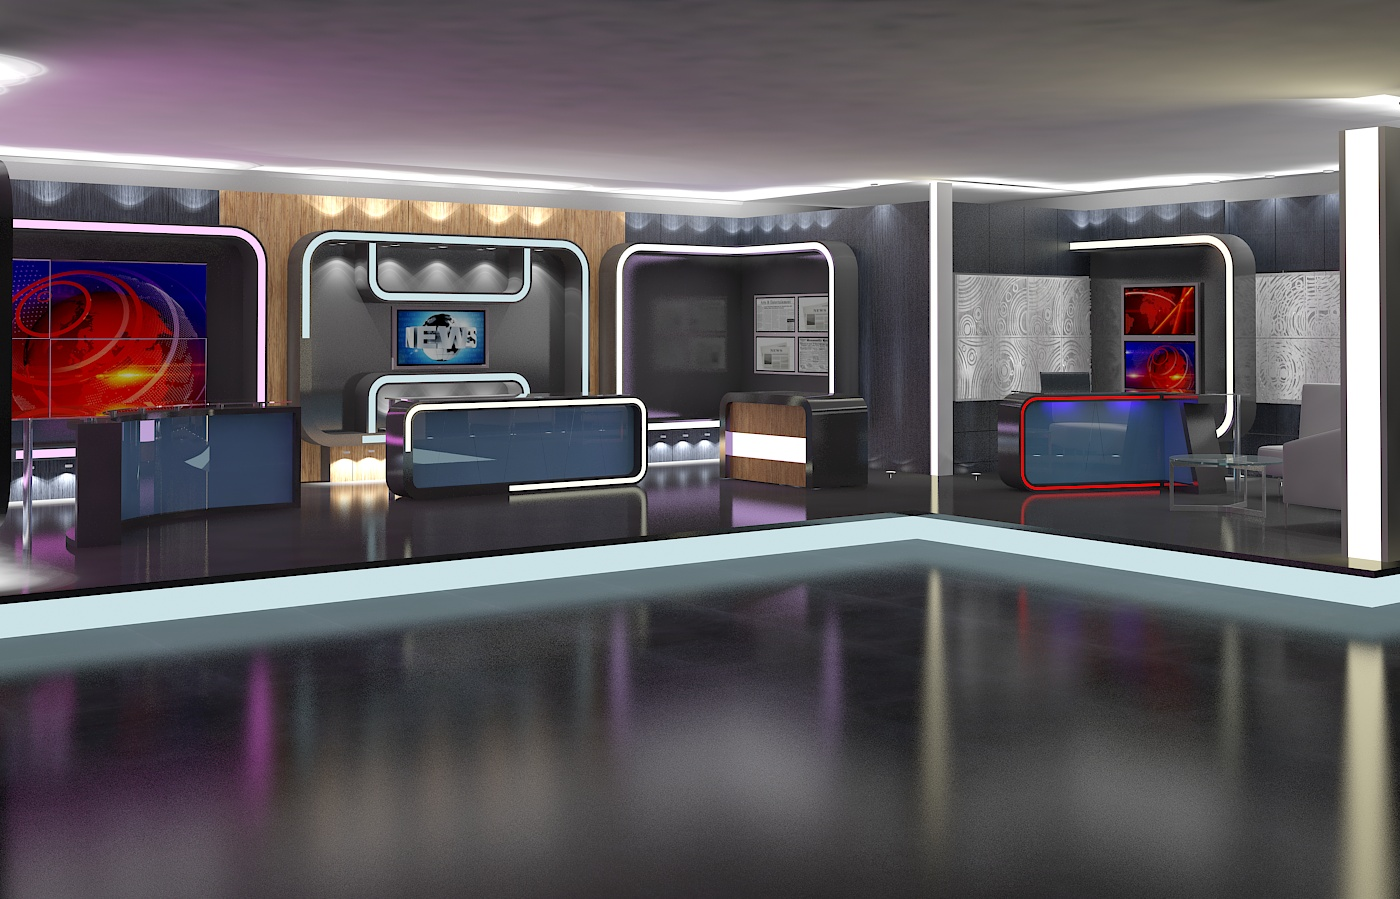 virtual tv studio news set 16 3d model 3ds max dxf fbx obj 223688